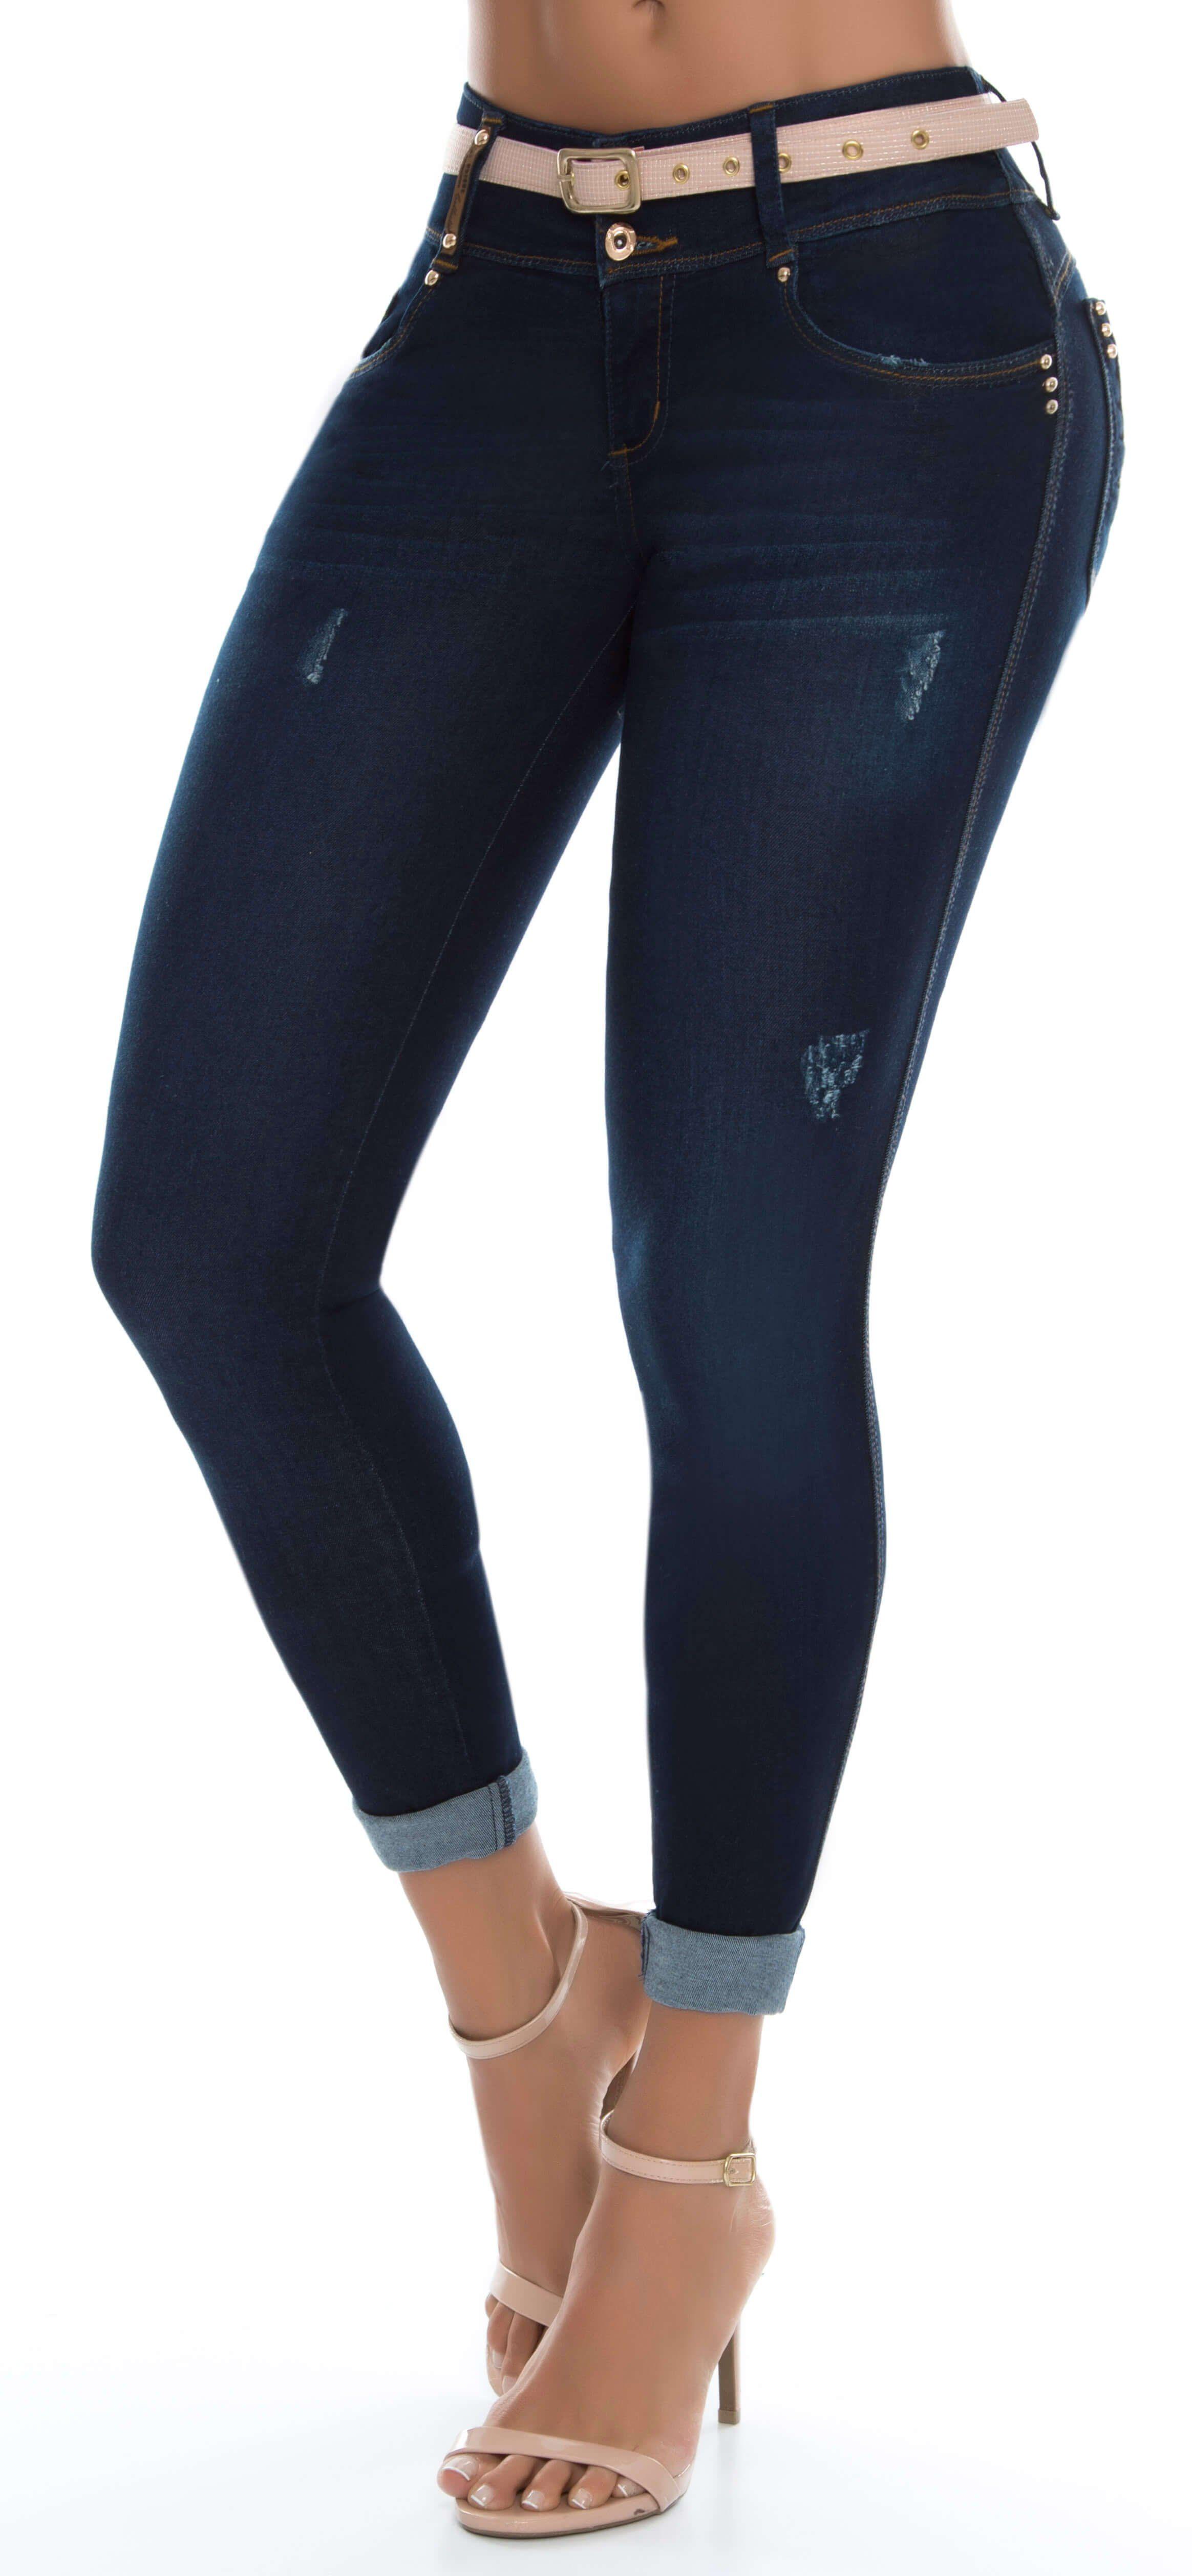 e9202e2014 Jeans levanta cola tiro medio color azul Ref  78976 marca LUJURIA. Silueta  ajustada con efecto push up